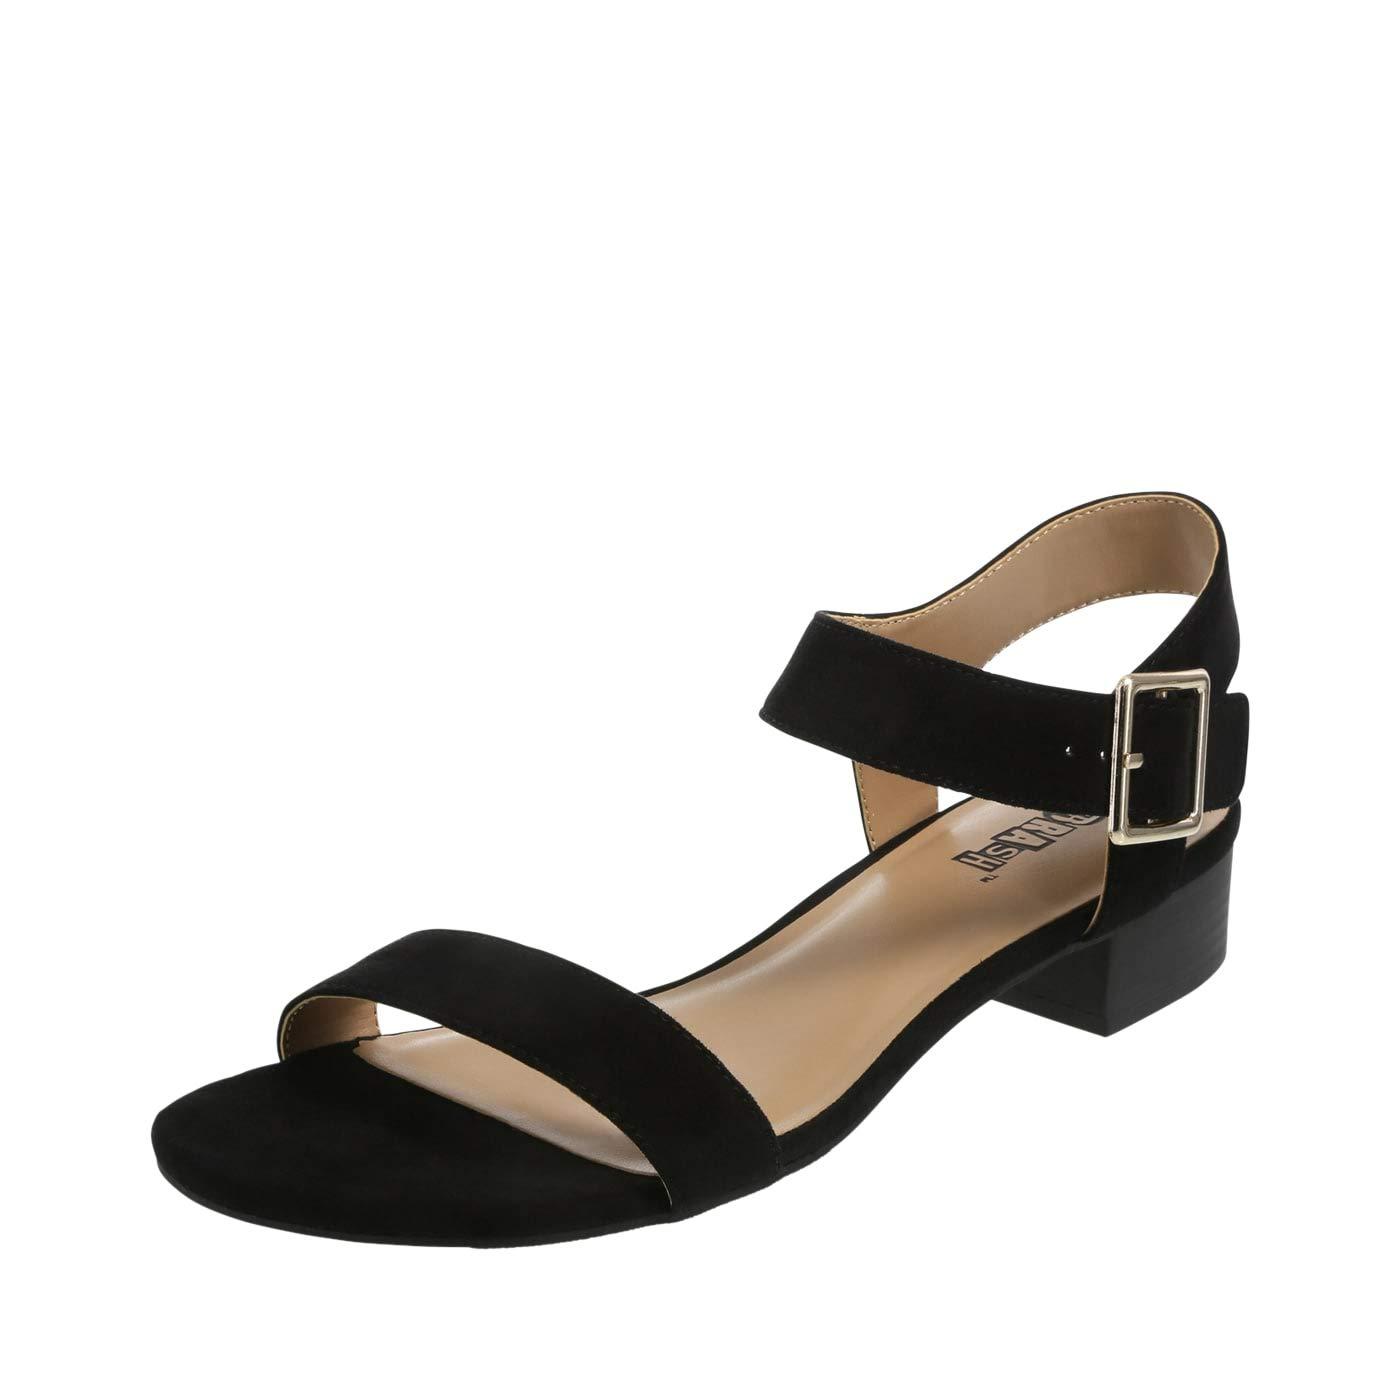 885443ce04 Amazon.com | Brash Women's Samara Low Block Heel Sandal | Sandals